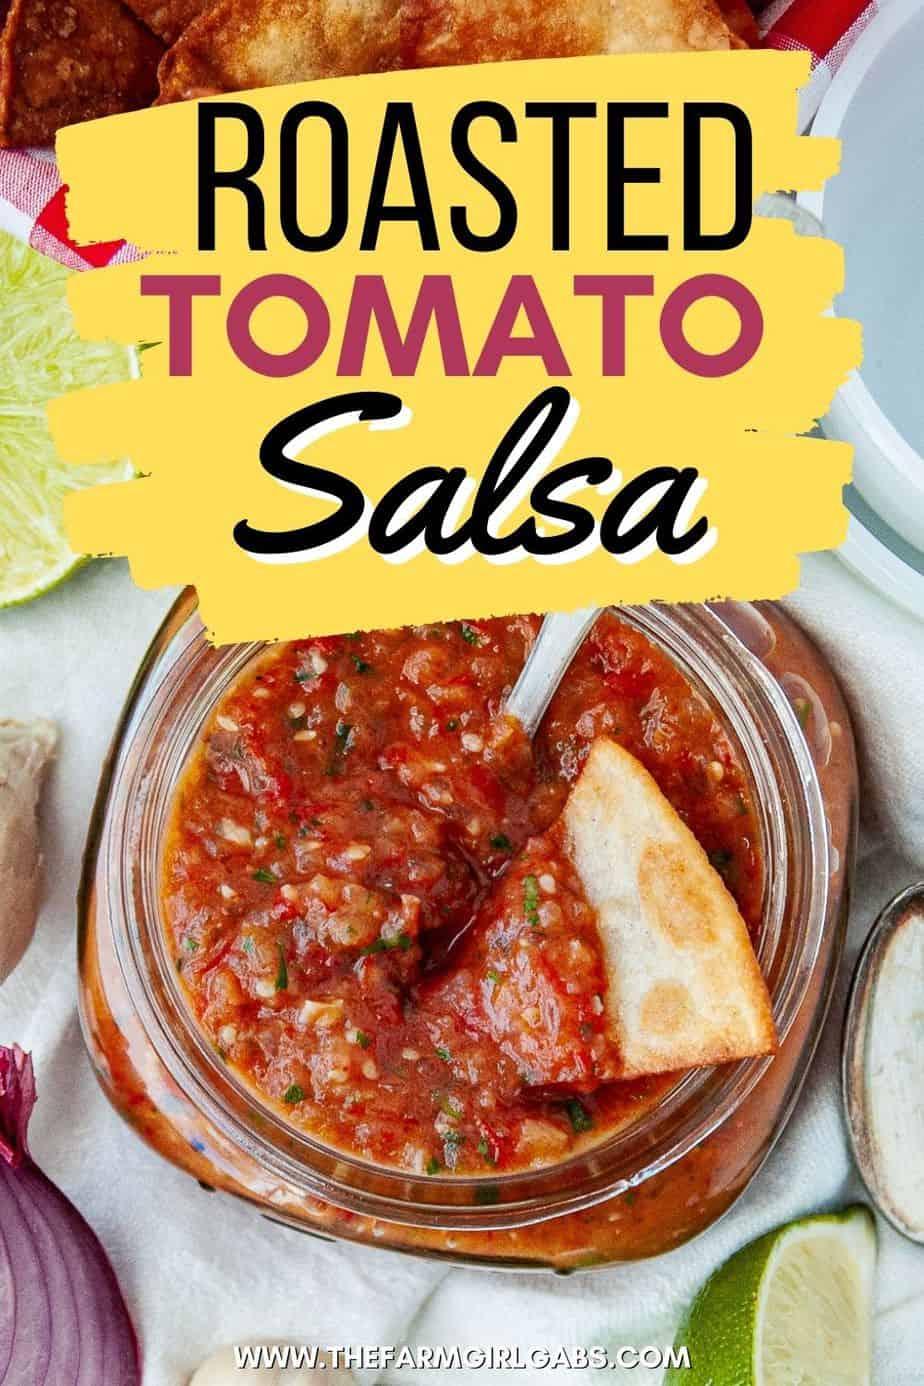 Roasted tomato and tomatillo salsa